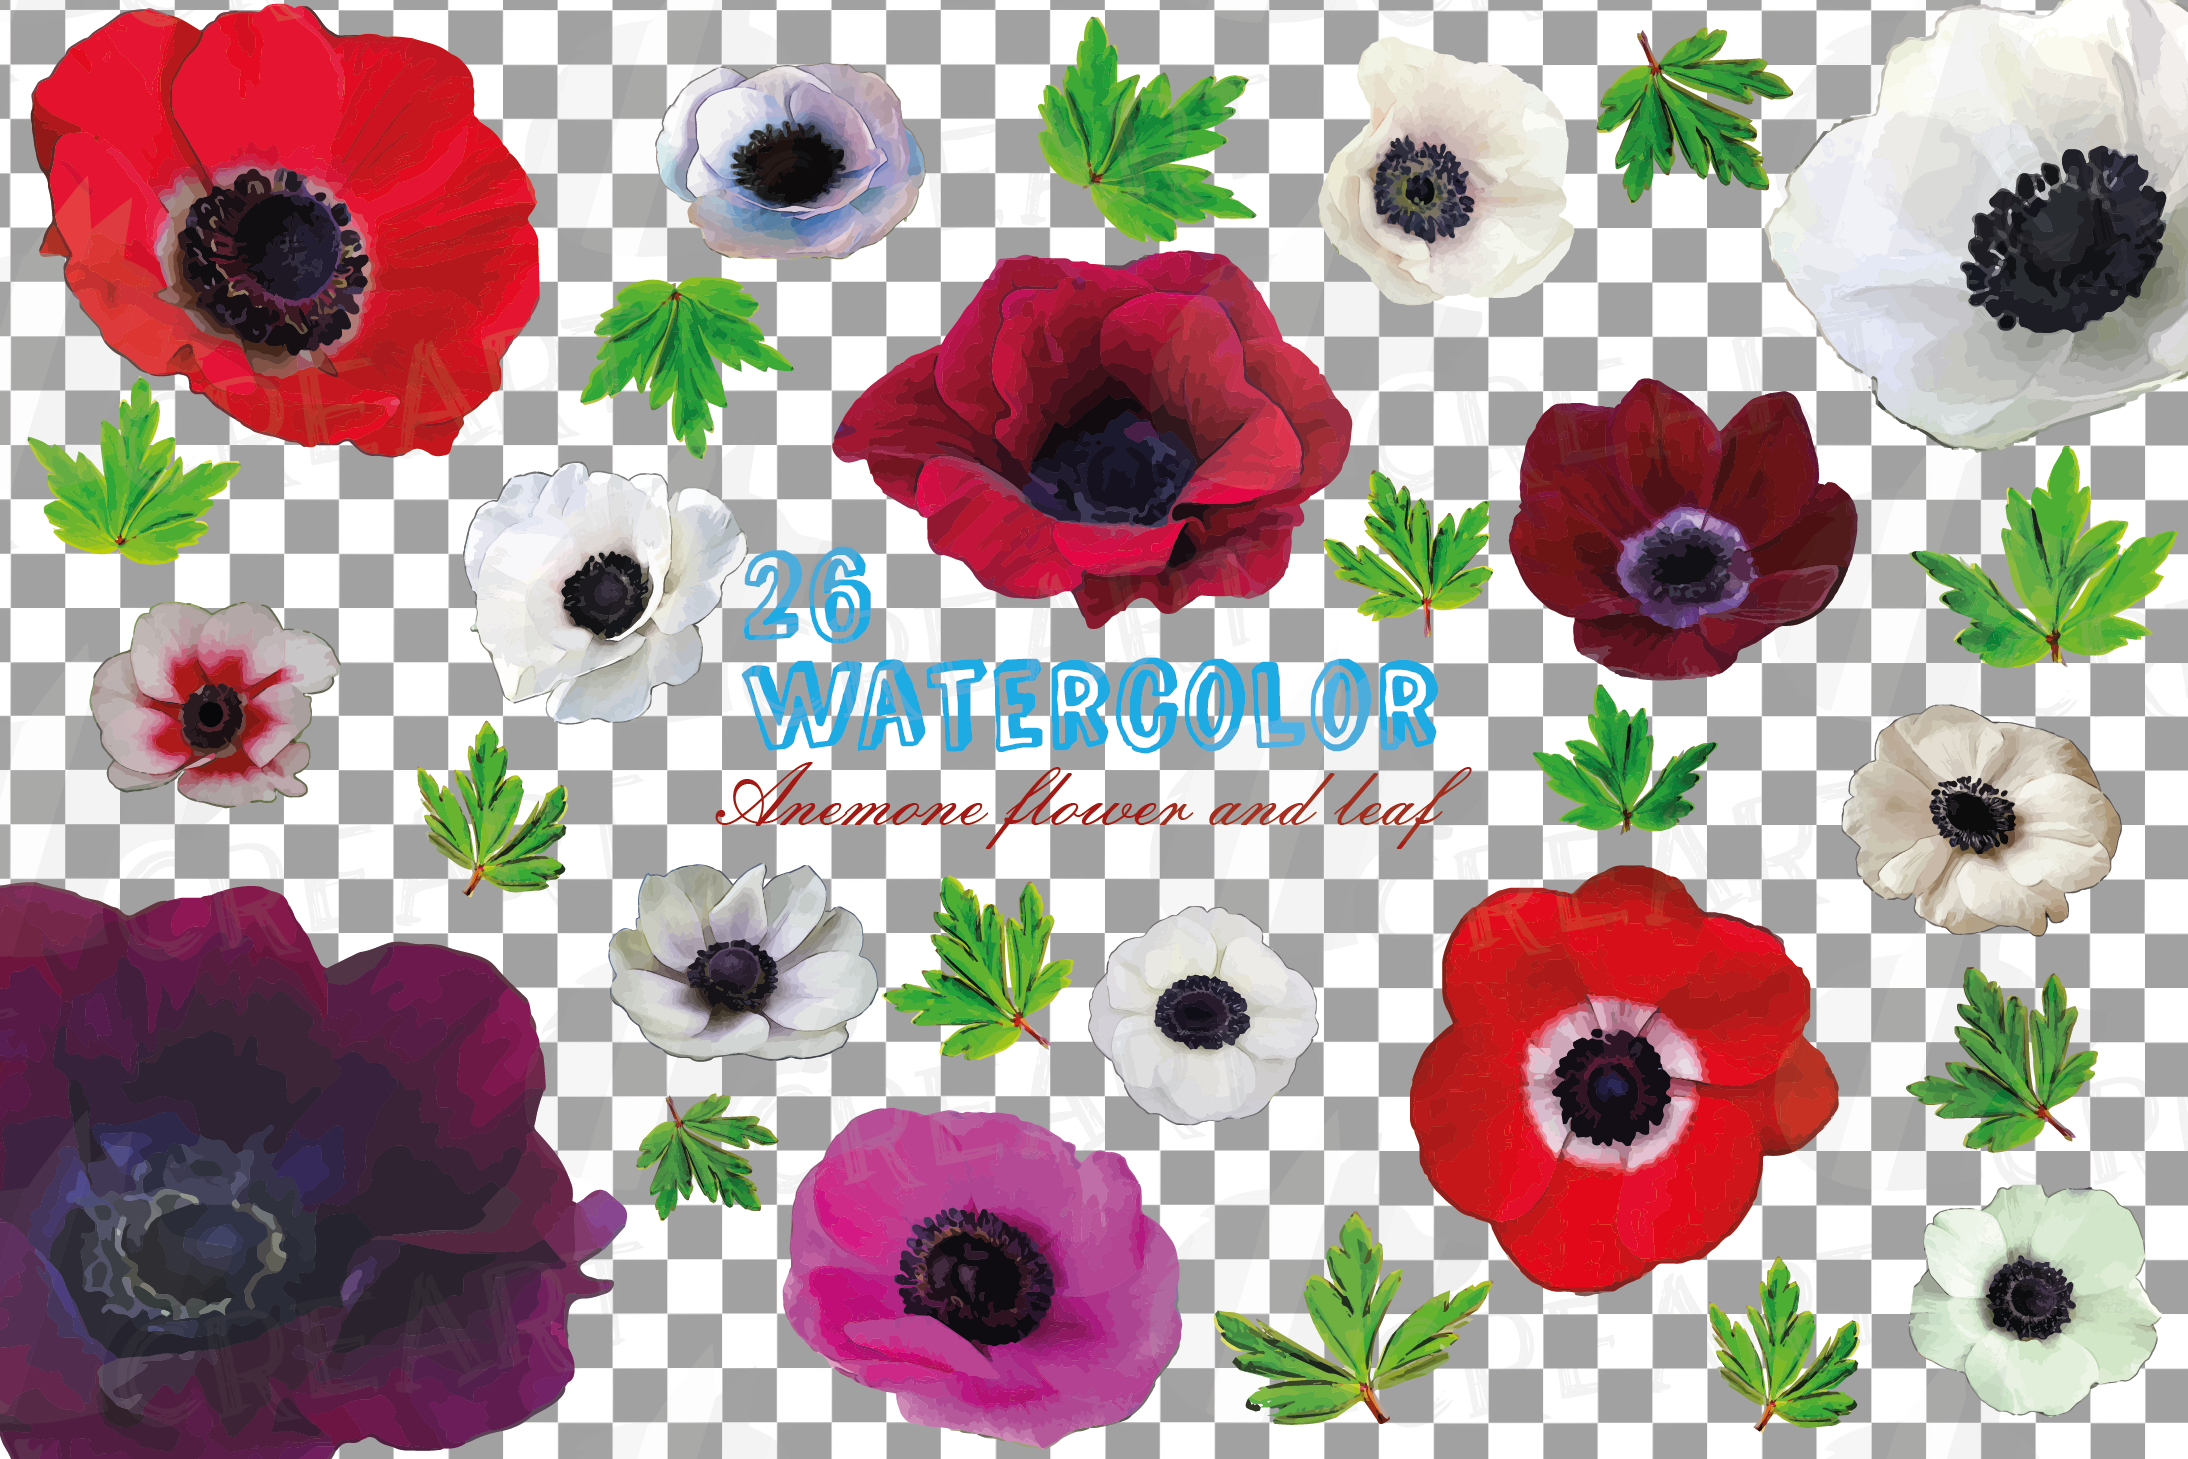 Anemone watercolor clip art pack, watercolor anemone design example image 2